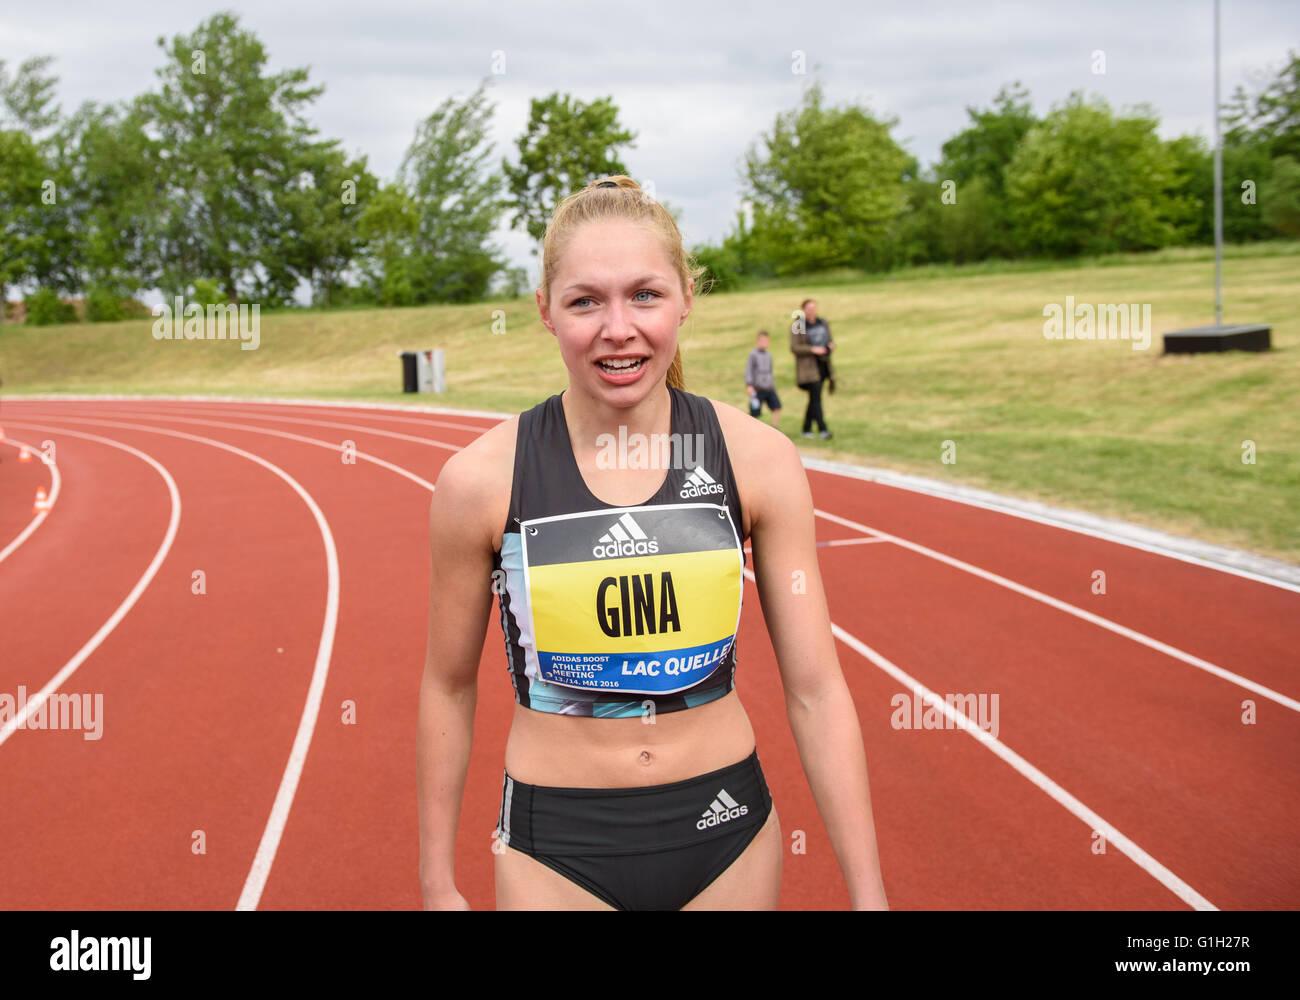 Herzogenaurach, Germany. 14th May, 2016. Gina Lueckenkemper of LG Olympia Dortmund celebrates after winning in the - Stock Image